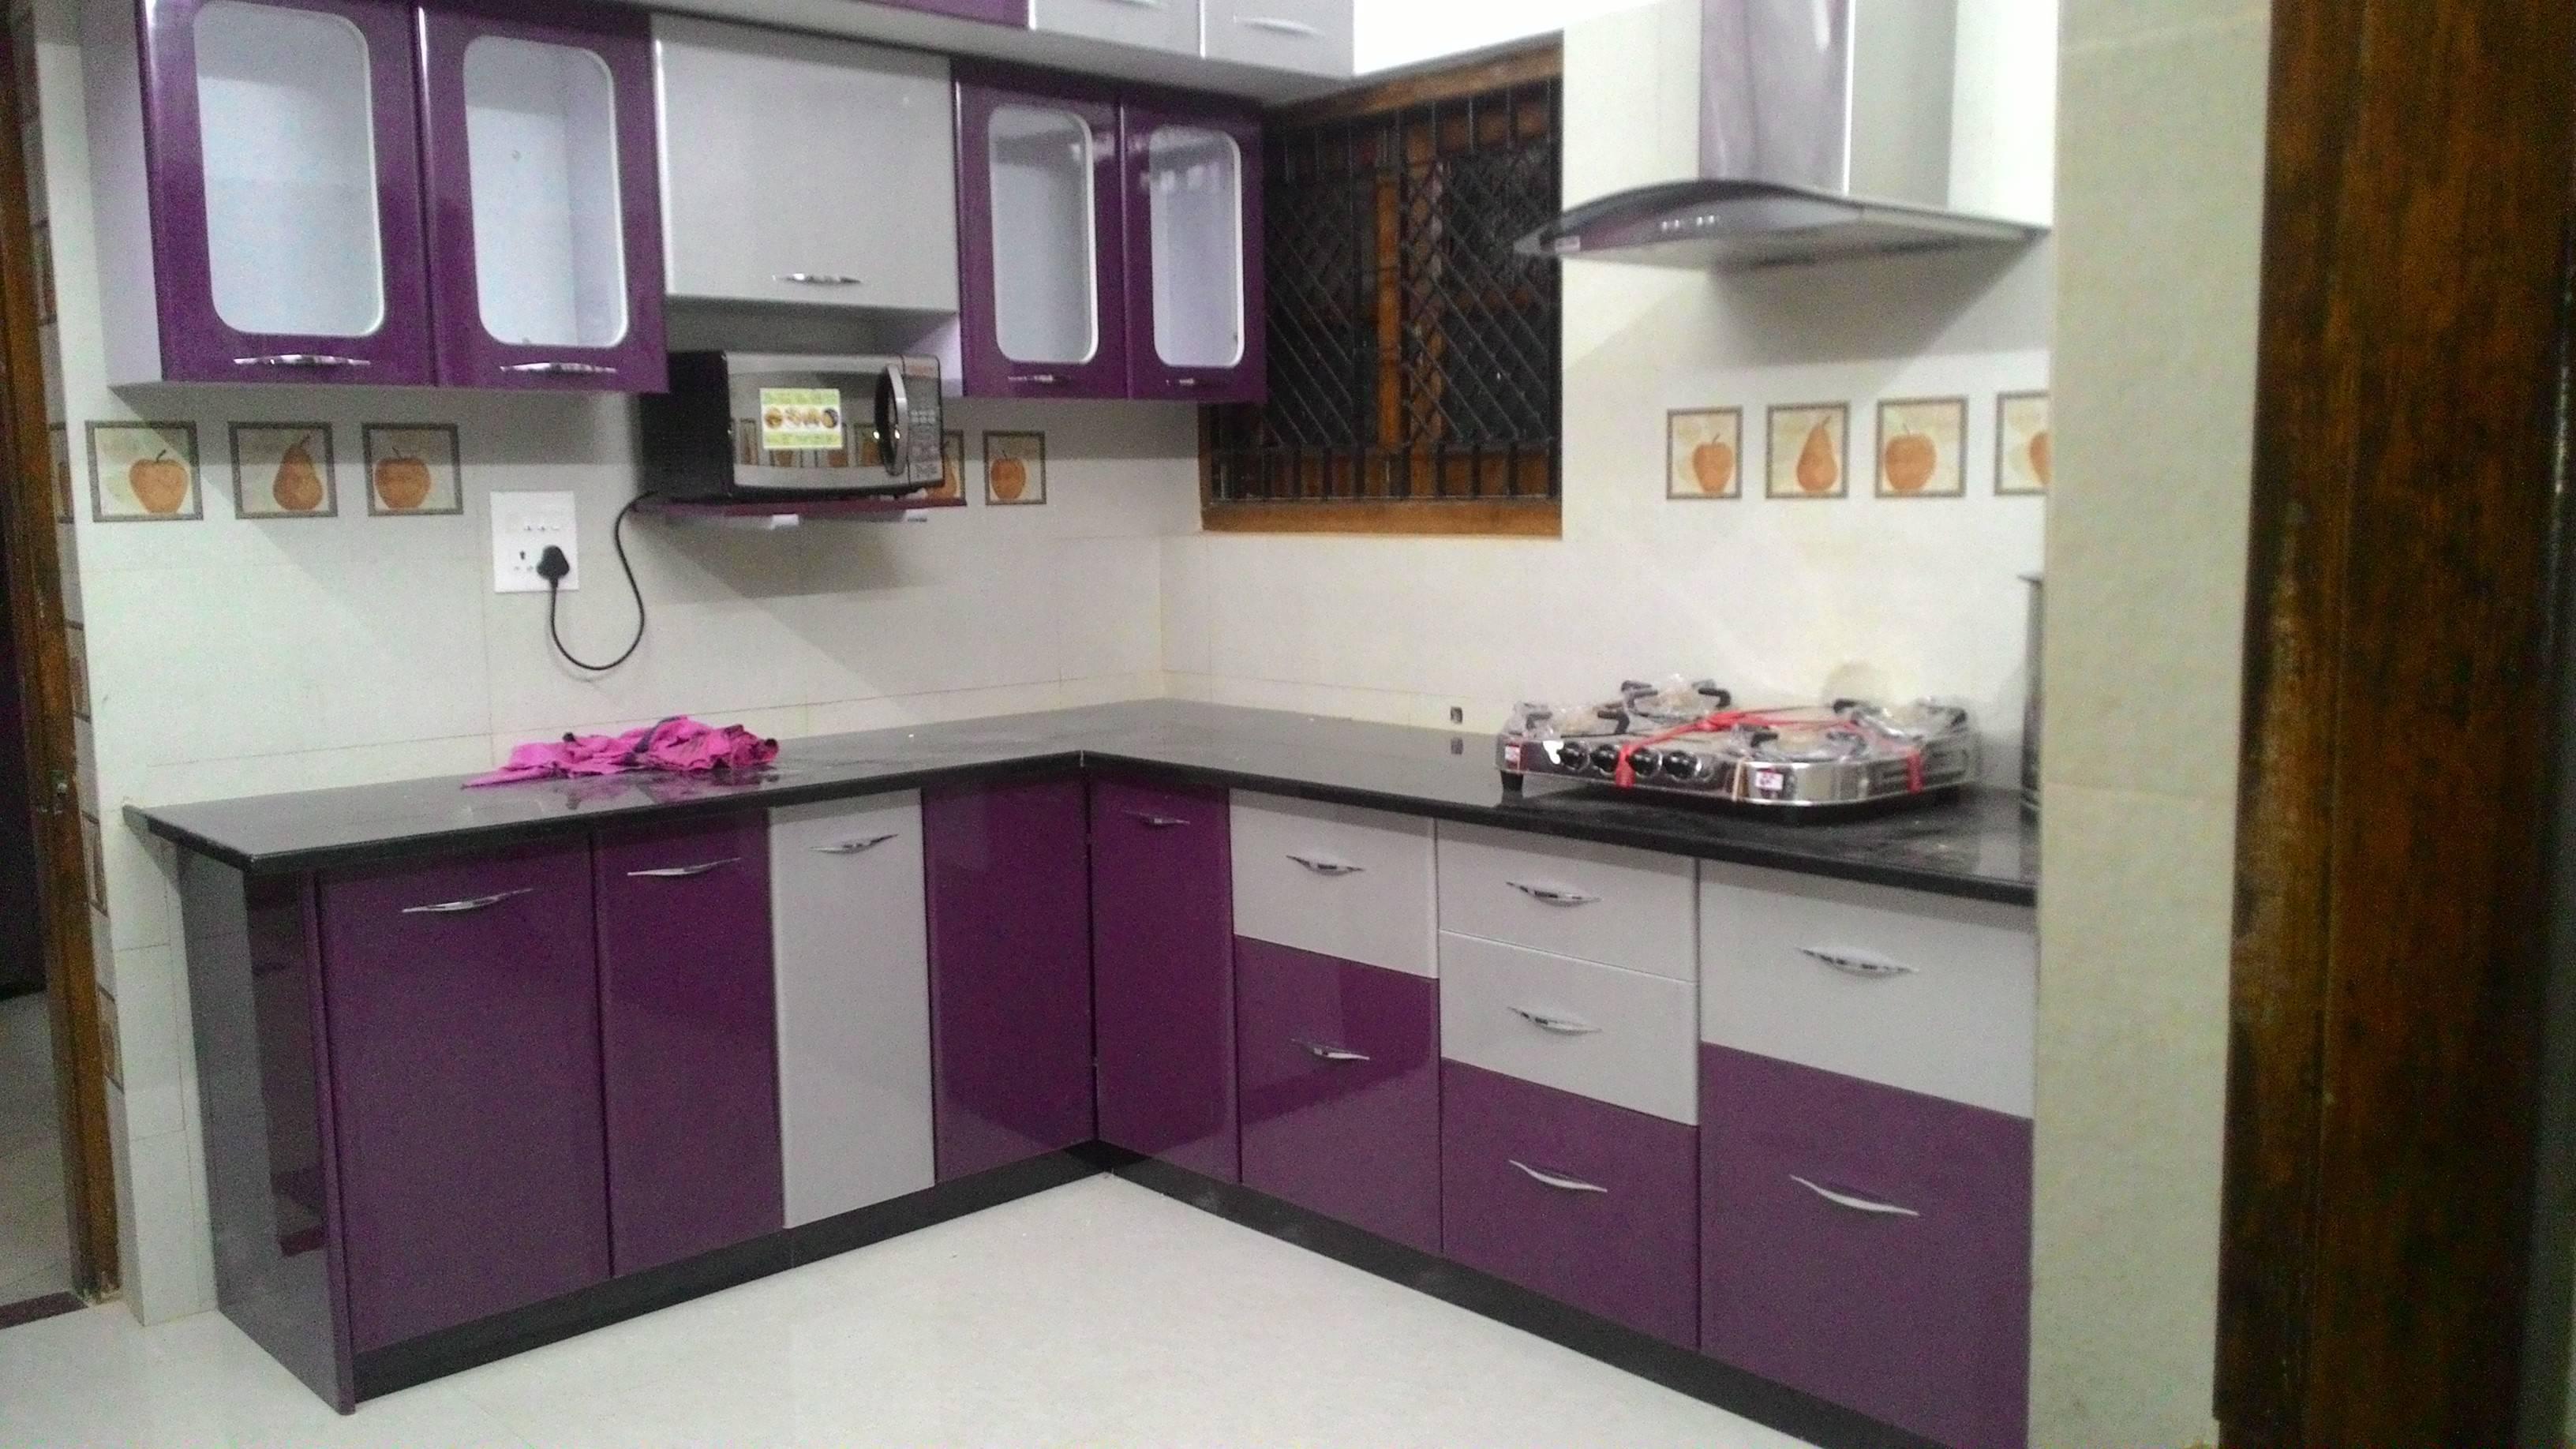 ... modular kitchen design - rachana modular kitchen photos, lashkaribag, nagpur QTWPHLS